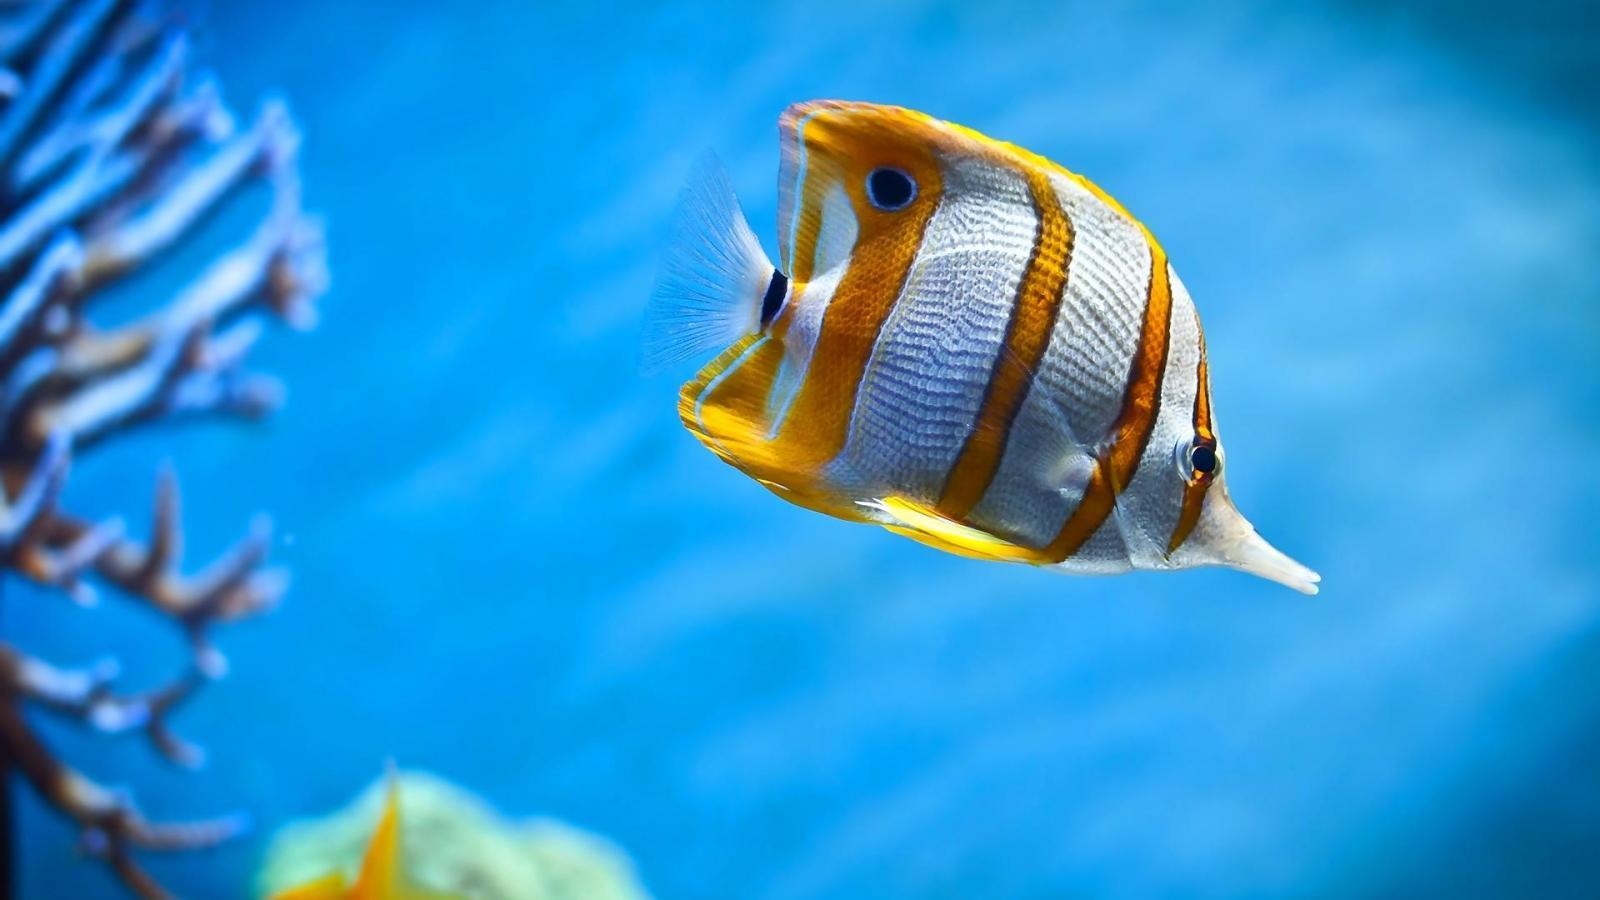 coral reef tropical fish wallpaper   91420   HQ Desktop Wallpapers 1600x900